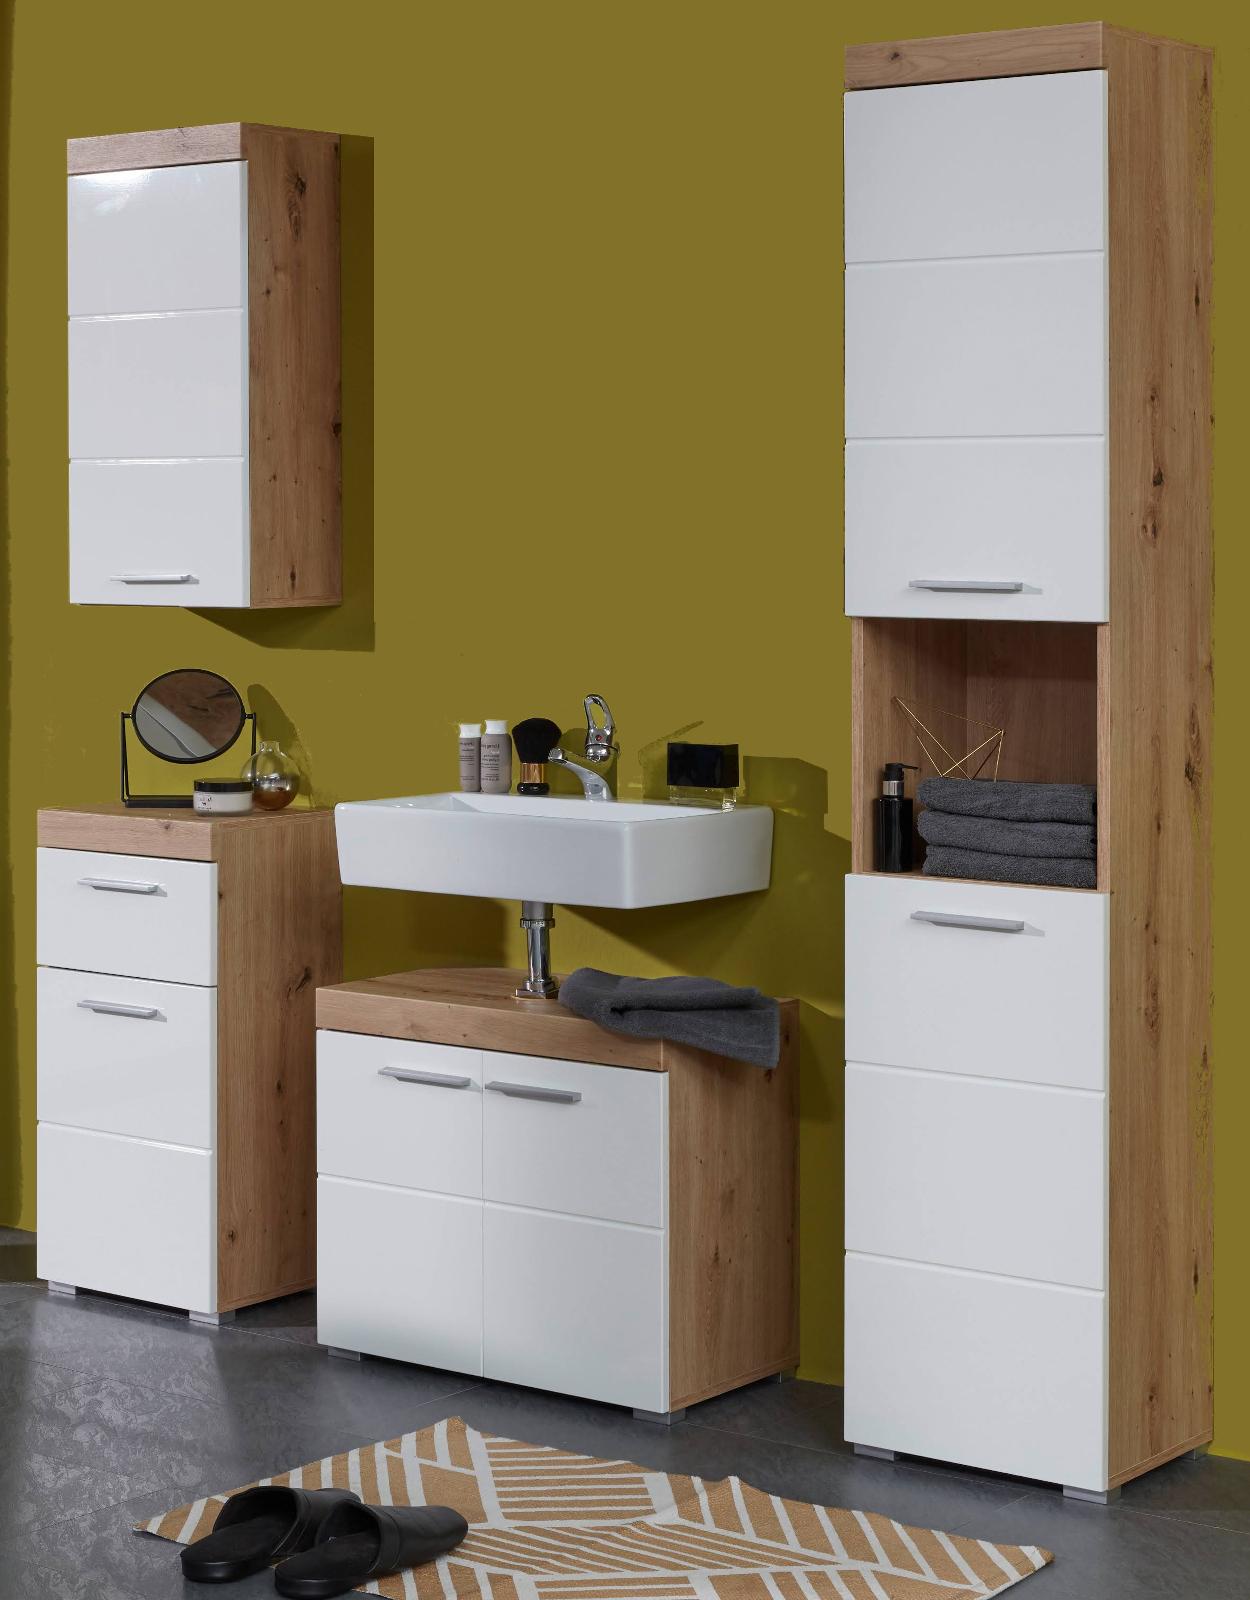 kinderbett jugendbett wei buche mixxi10. Black Bedroom Furniture Sets. Home Design Ideas